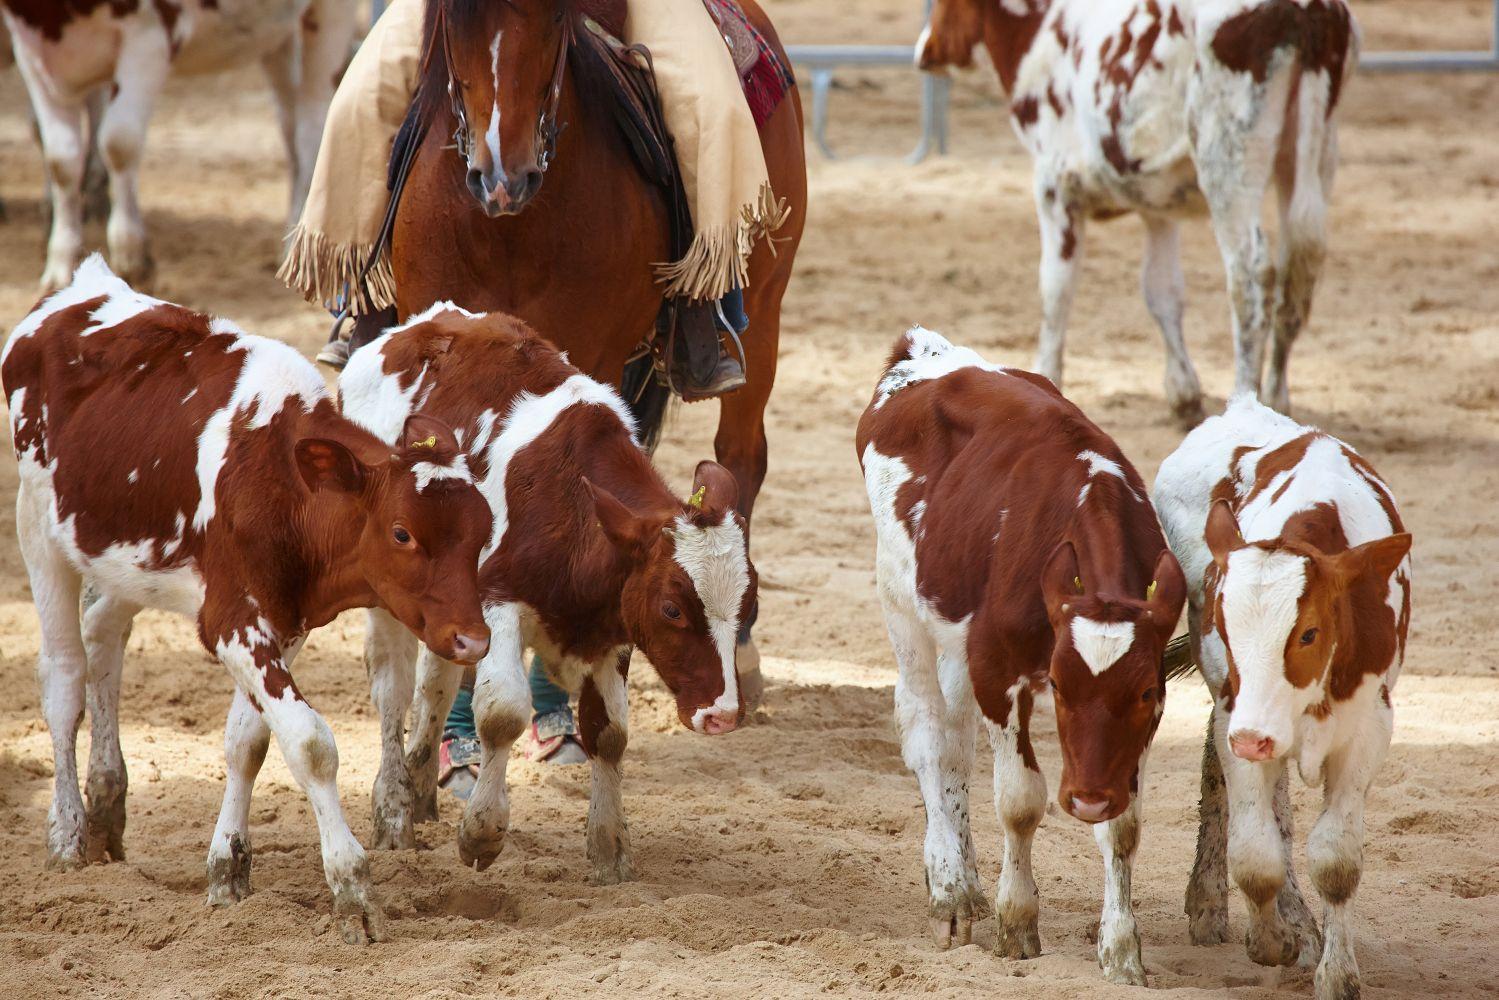 Texarkana, TX's professional cattle auctions